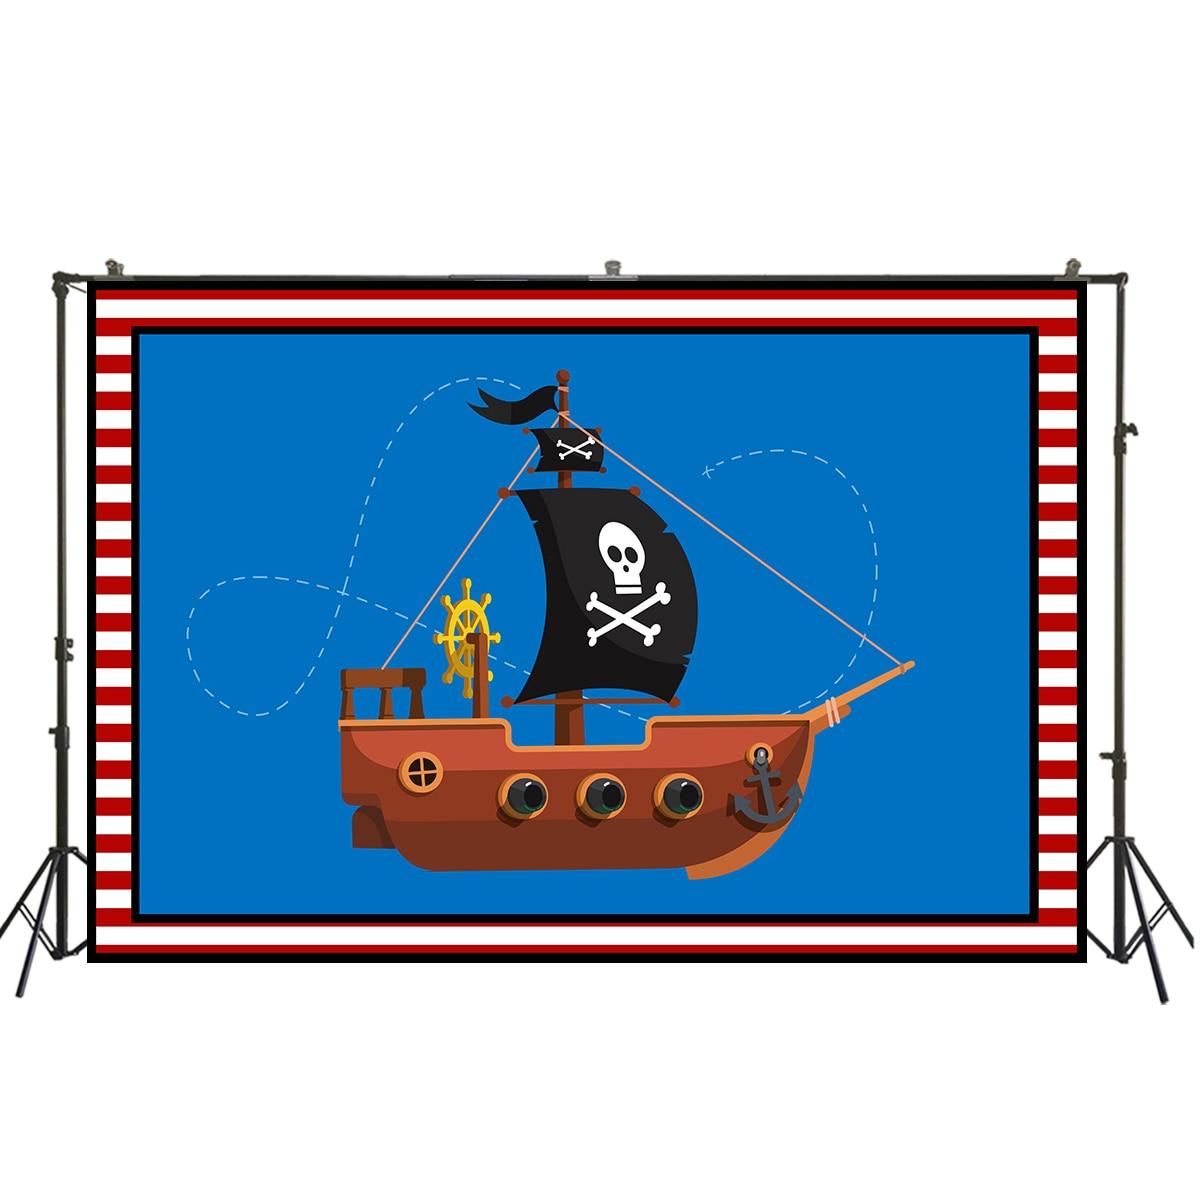 Huayi azul escuro tecido com navio pirata pano de fundo tema marinho caça ao tesouro menina menino adulto retrato decorationW-2087